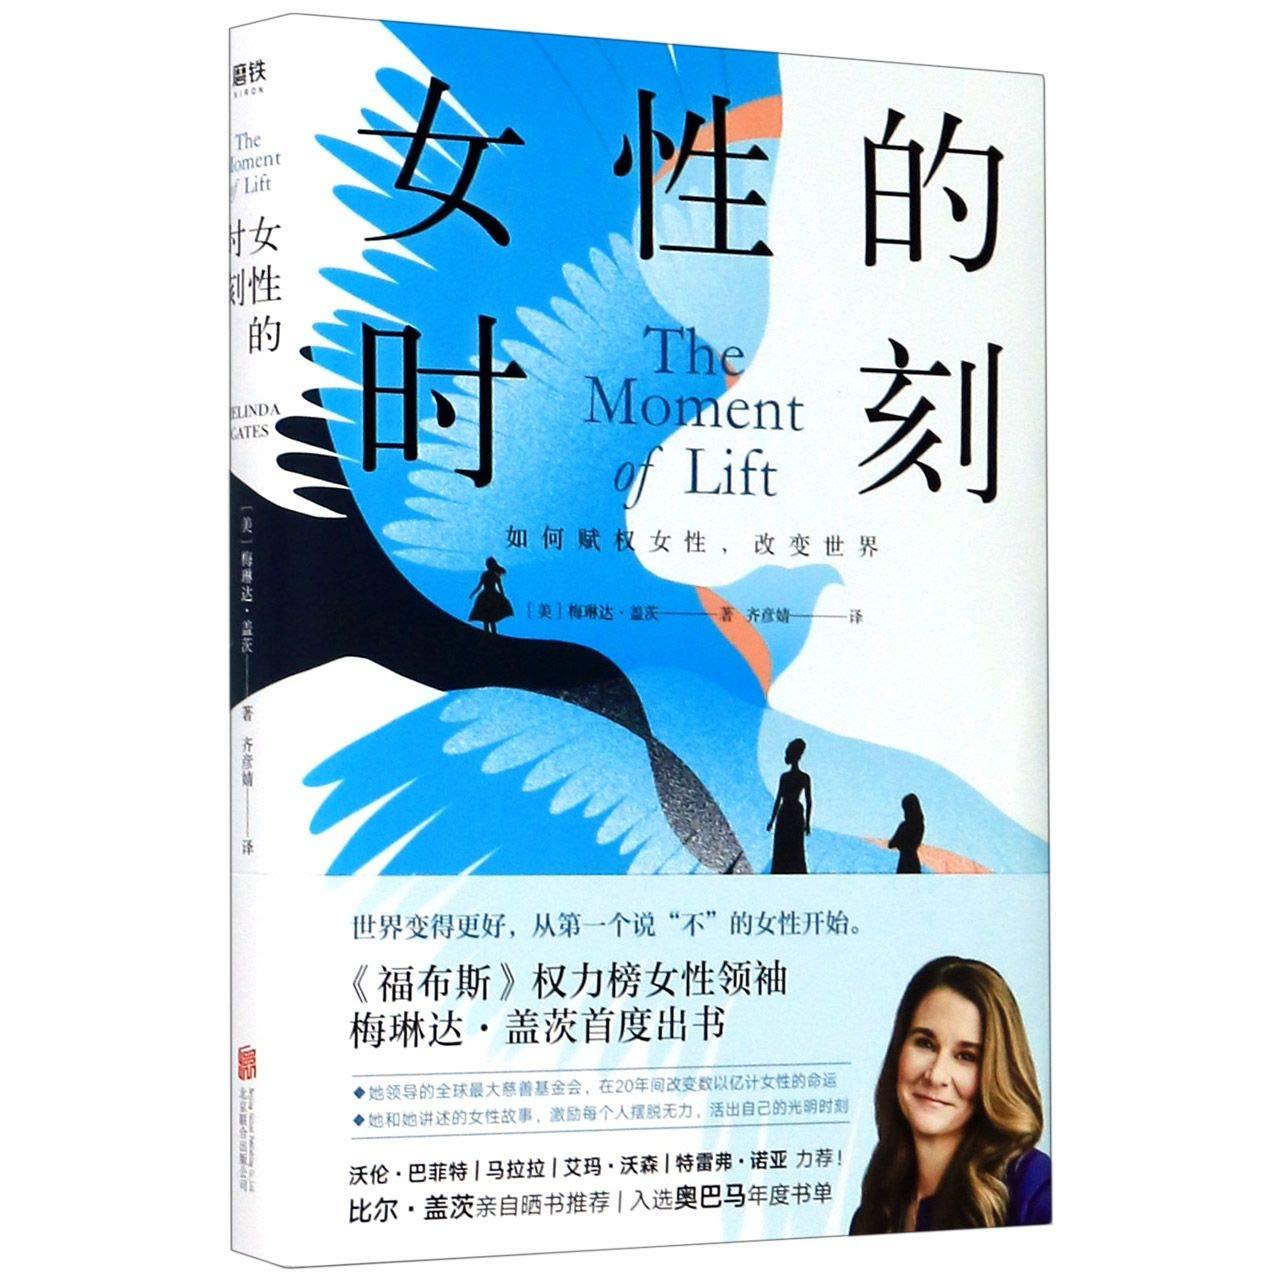 The Moment of Lift (Chinese Edition): Melinda Gates: 9787559623720:  Amazon.com: Books